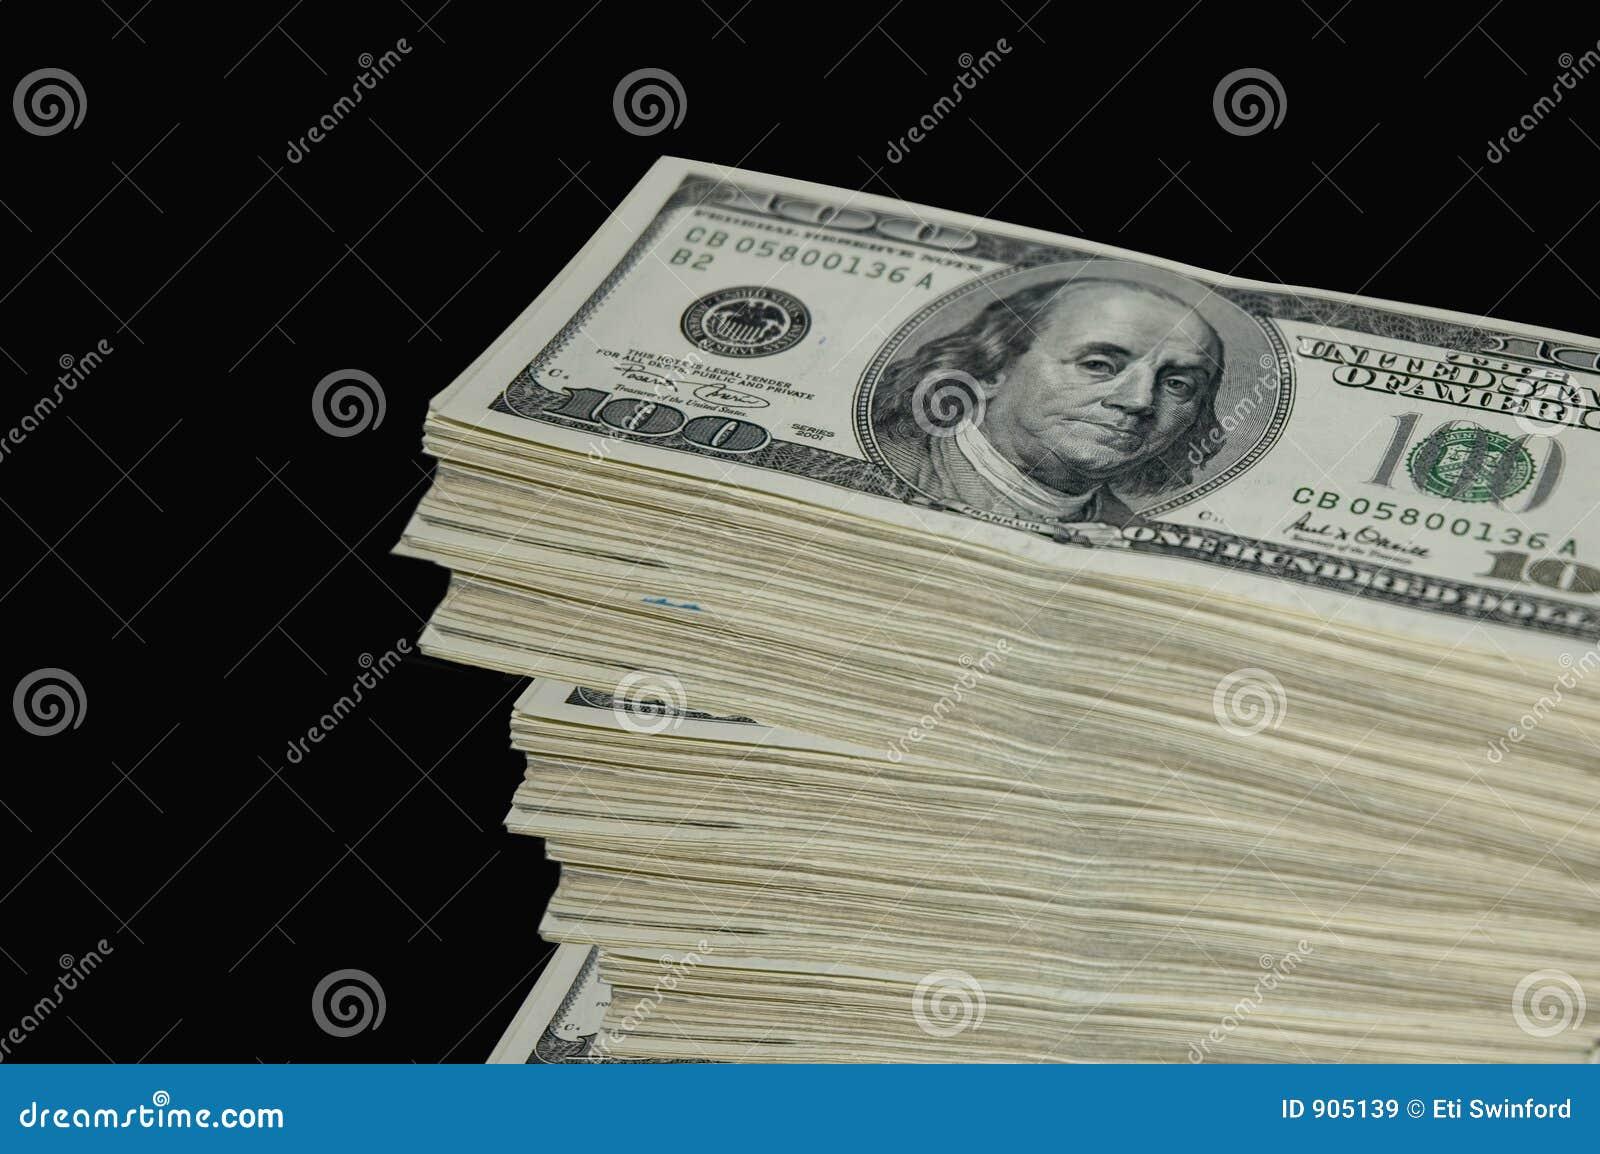 Cash Stacks Wallpaper Cash Money Stacks Wallpaper